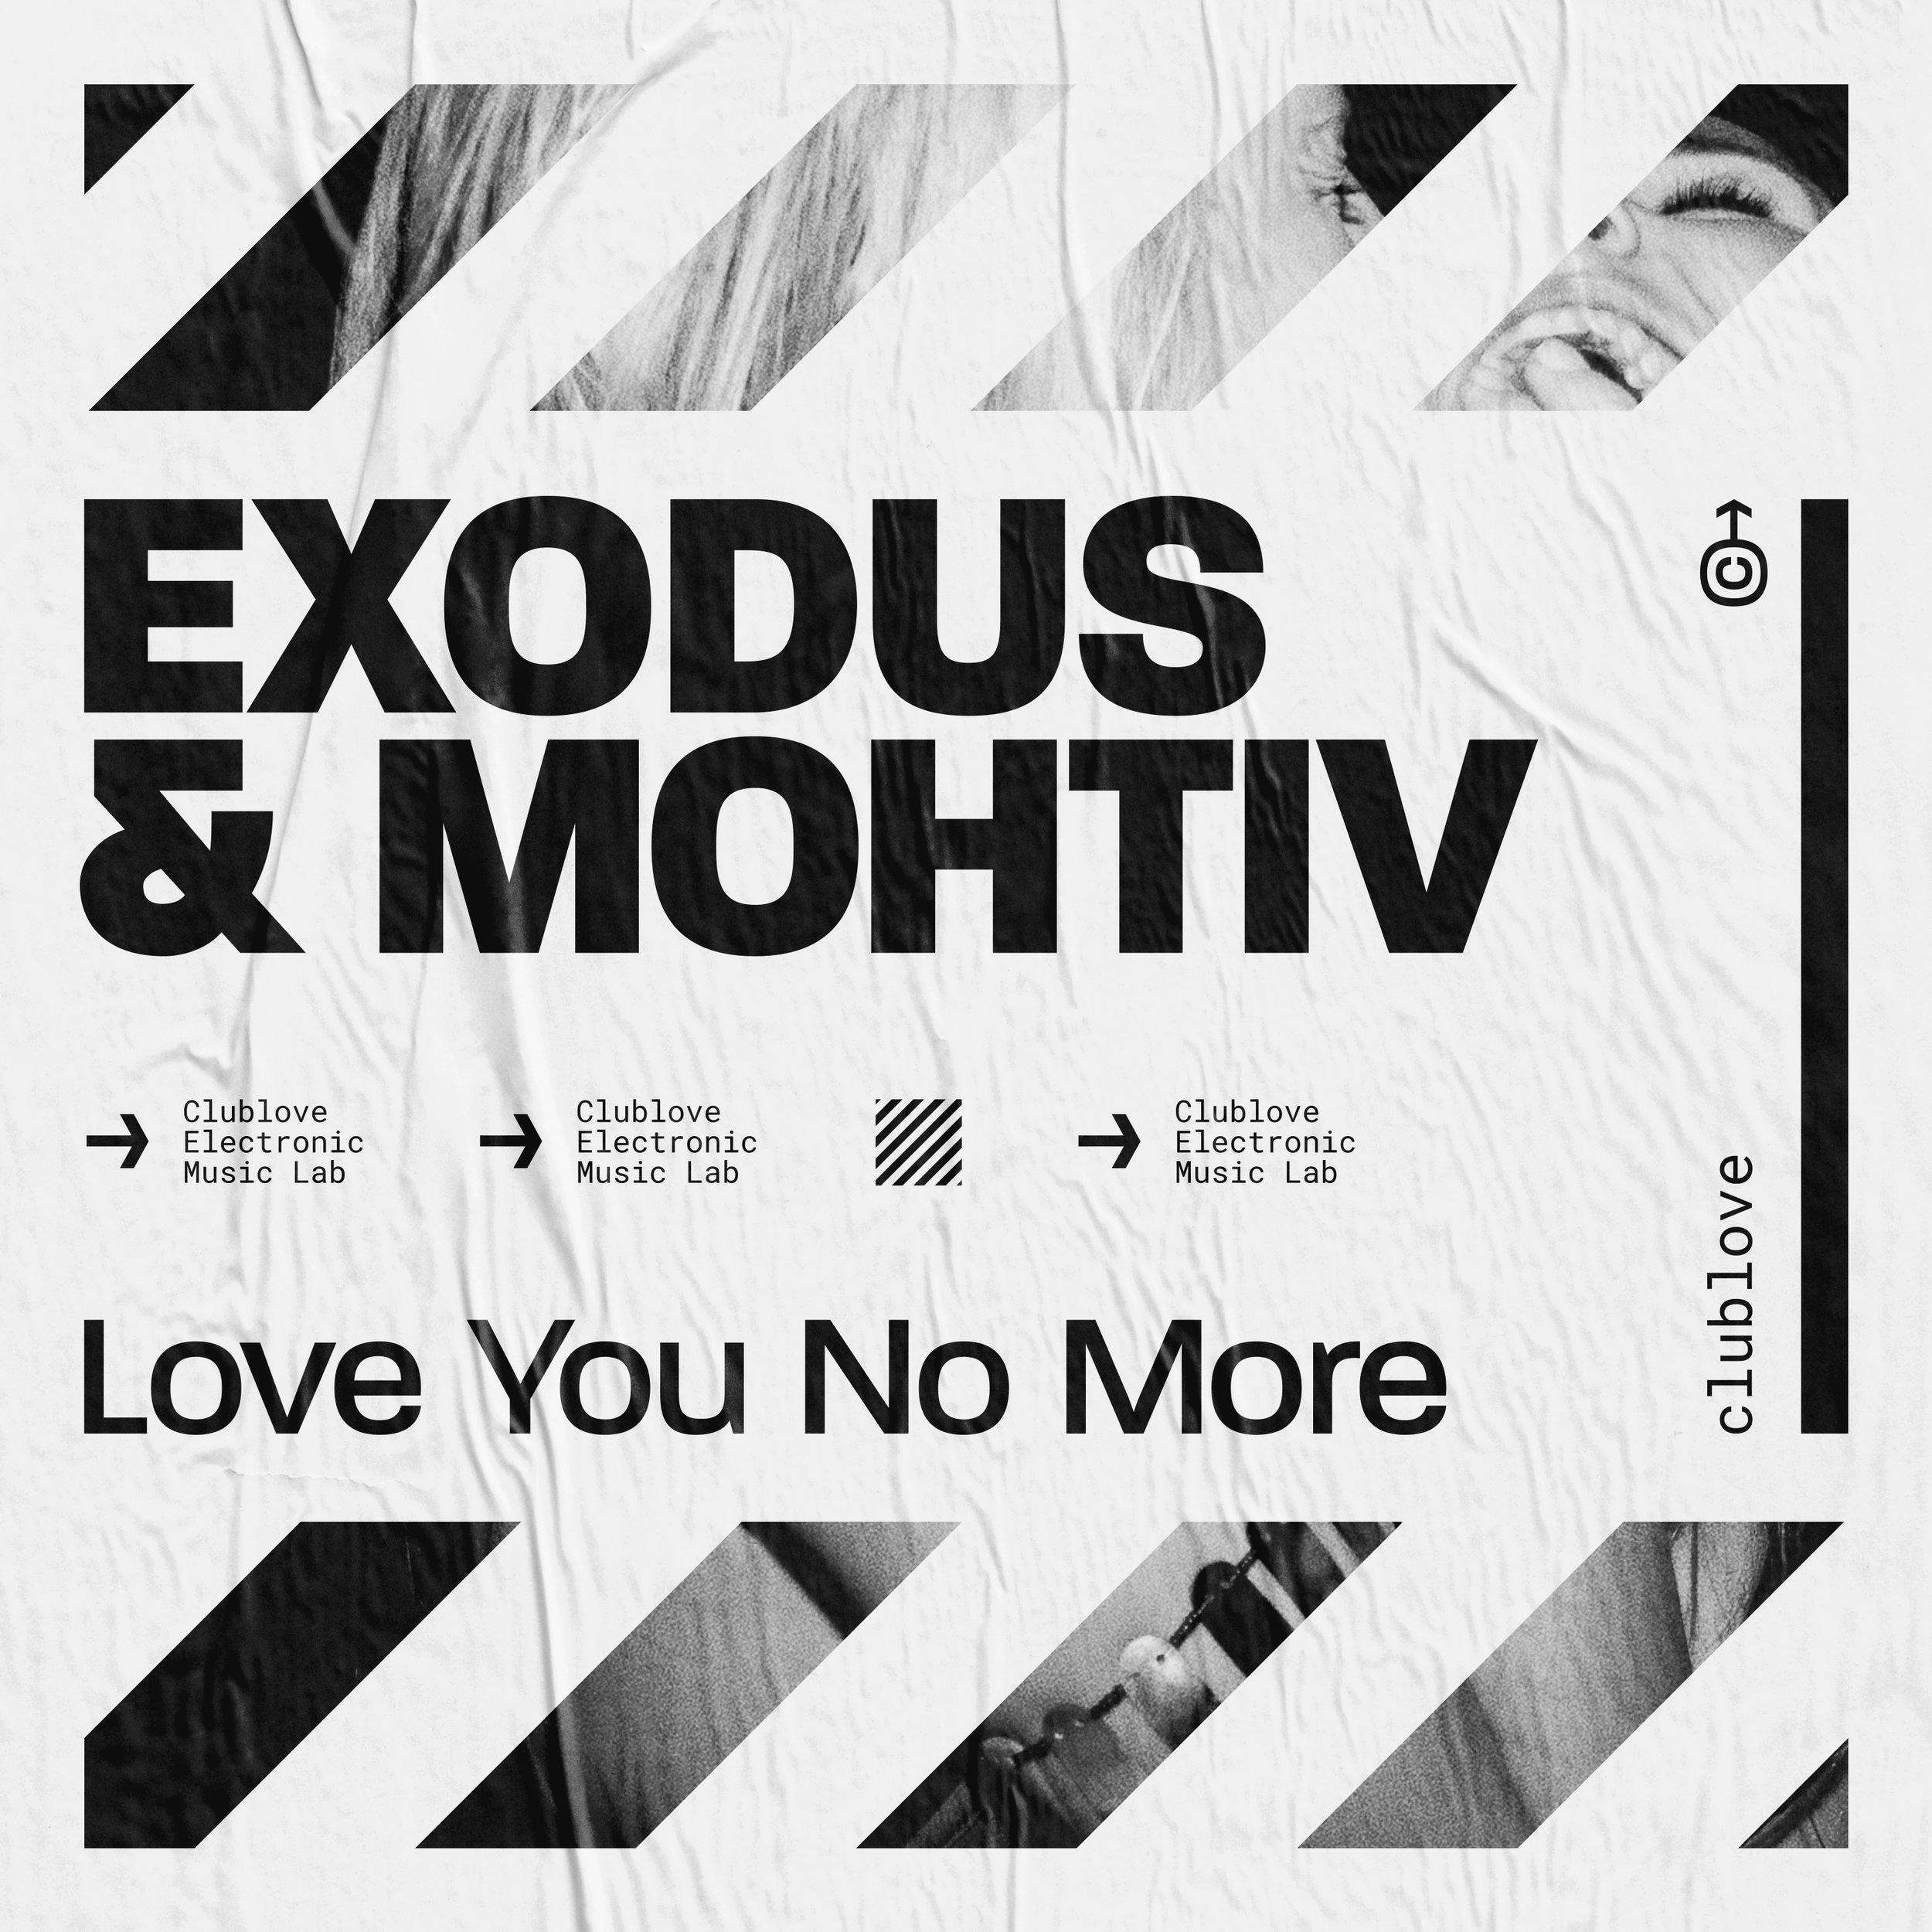 Clublove-Exodus-Love-You-No-More-packshot.jpg